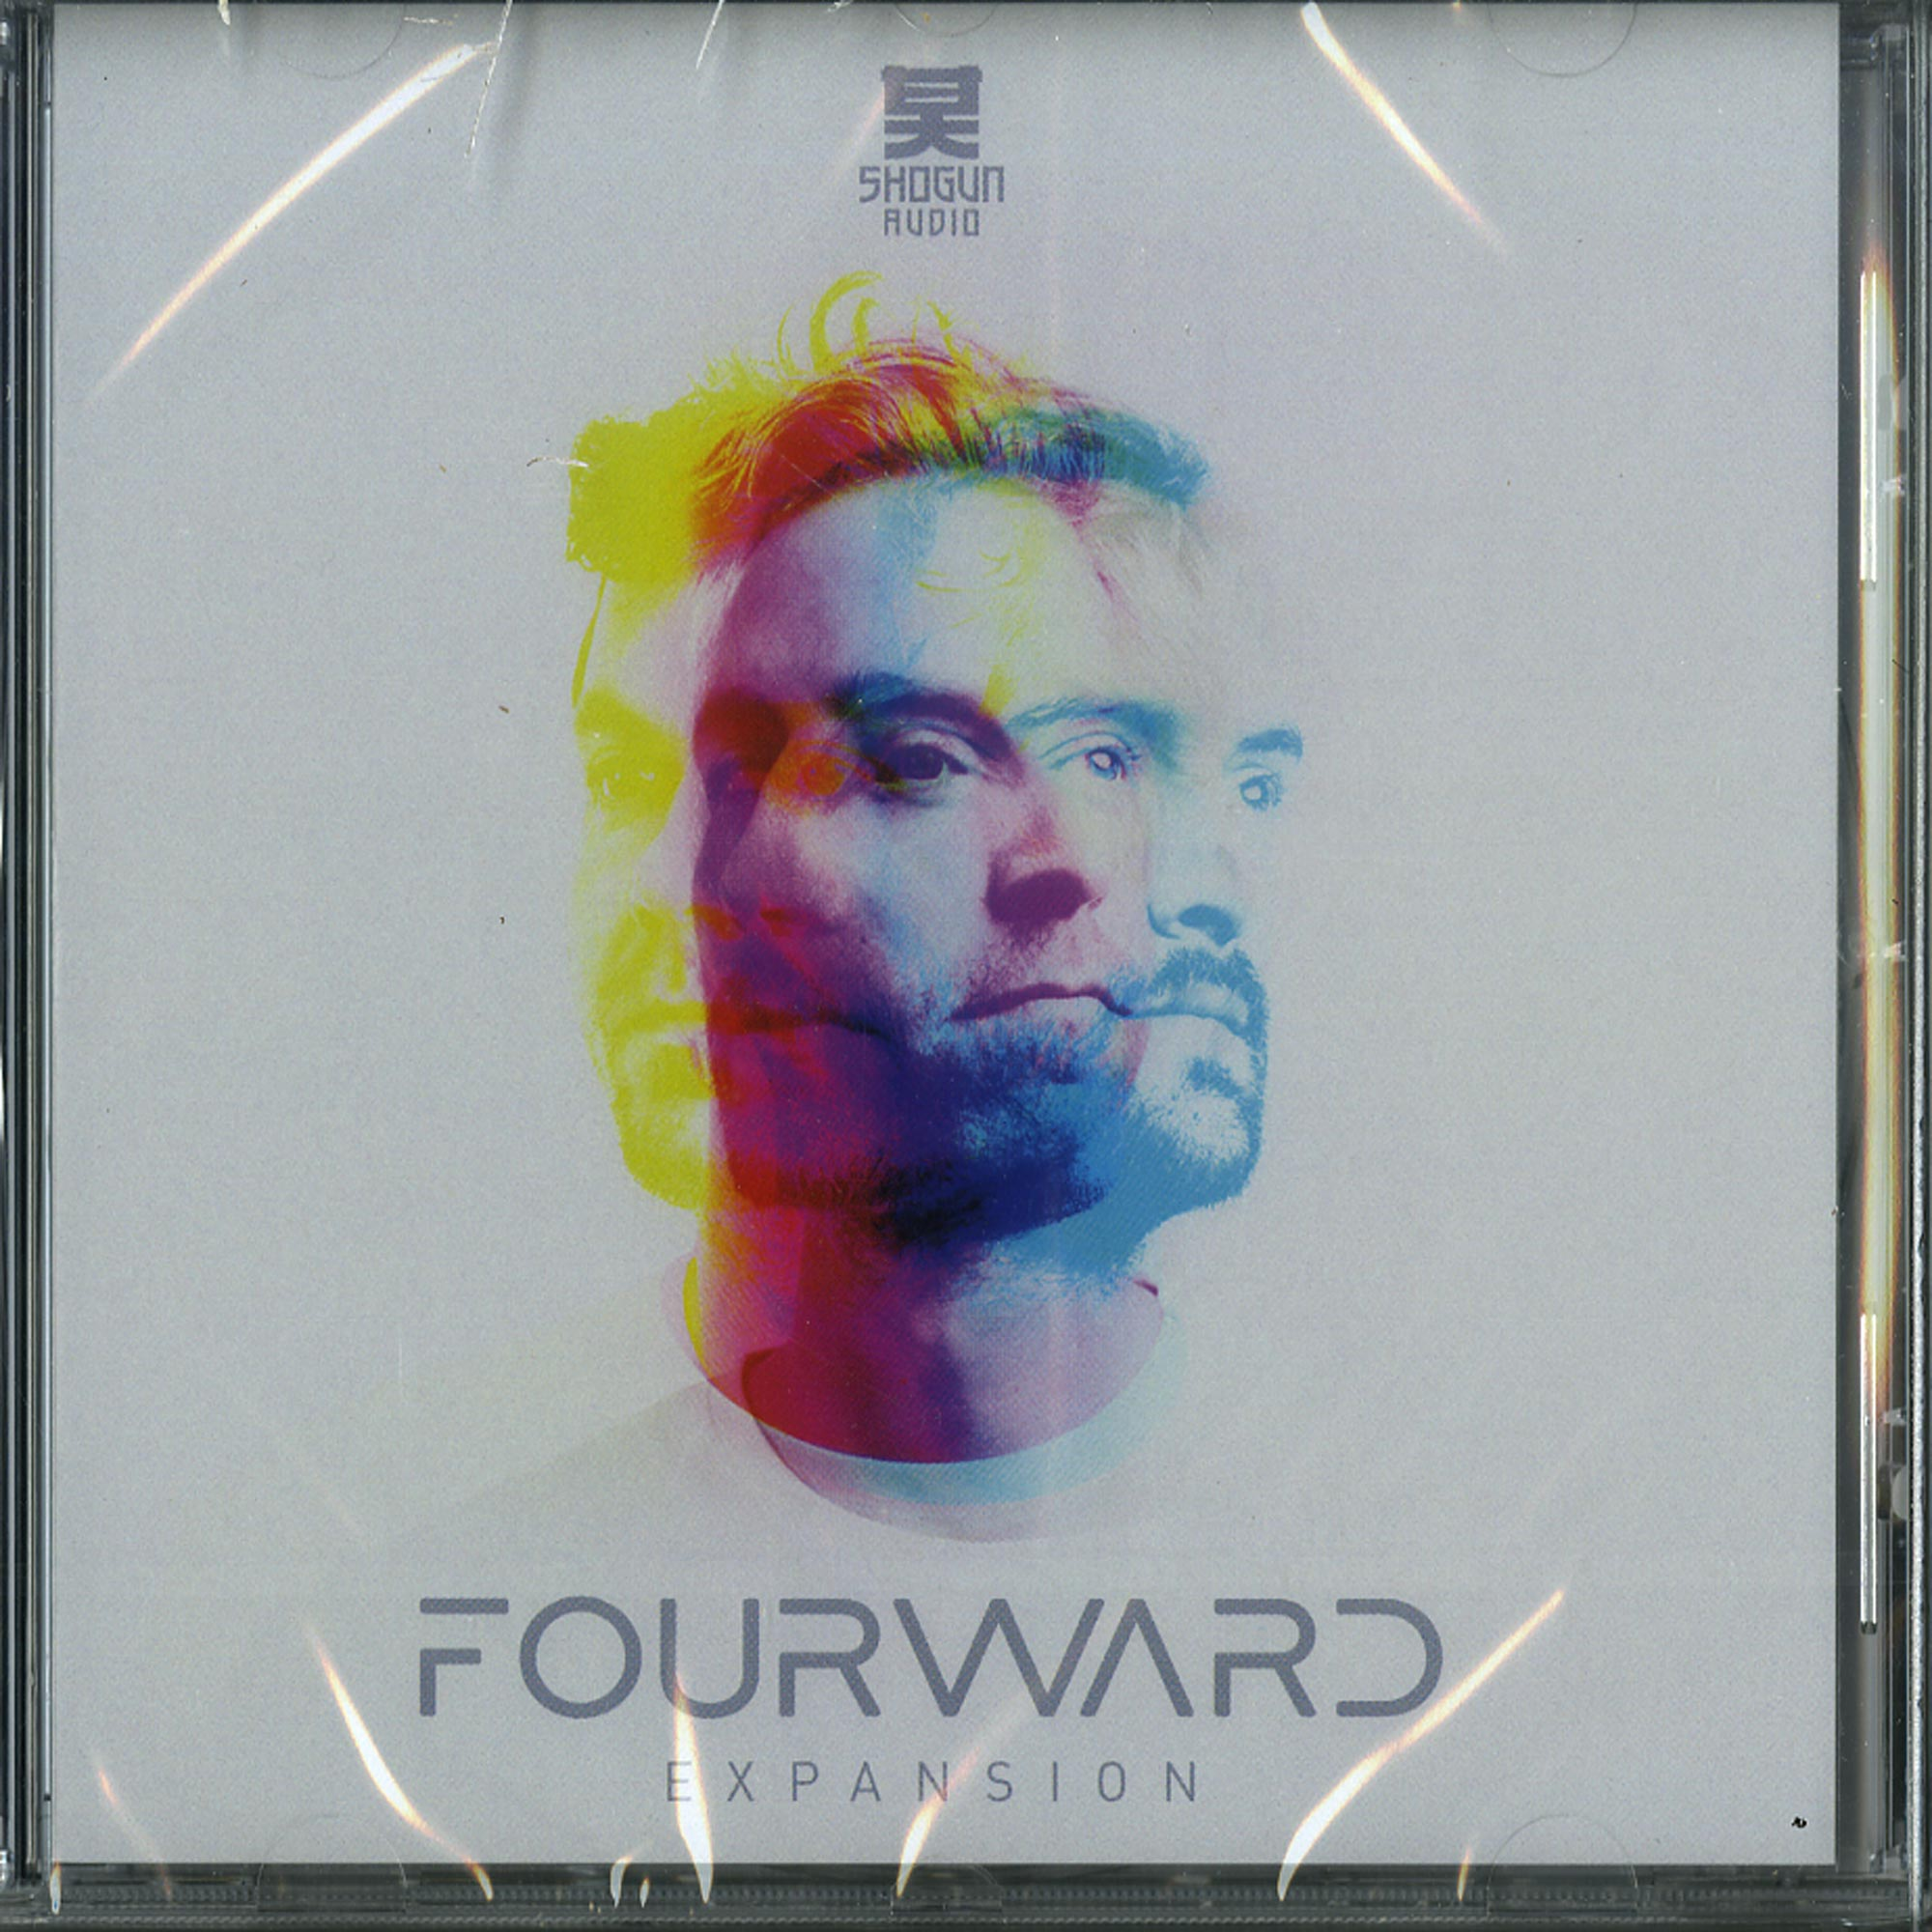 Fourward - EXPANSION